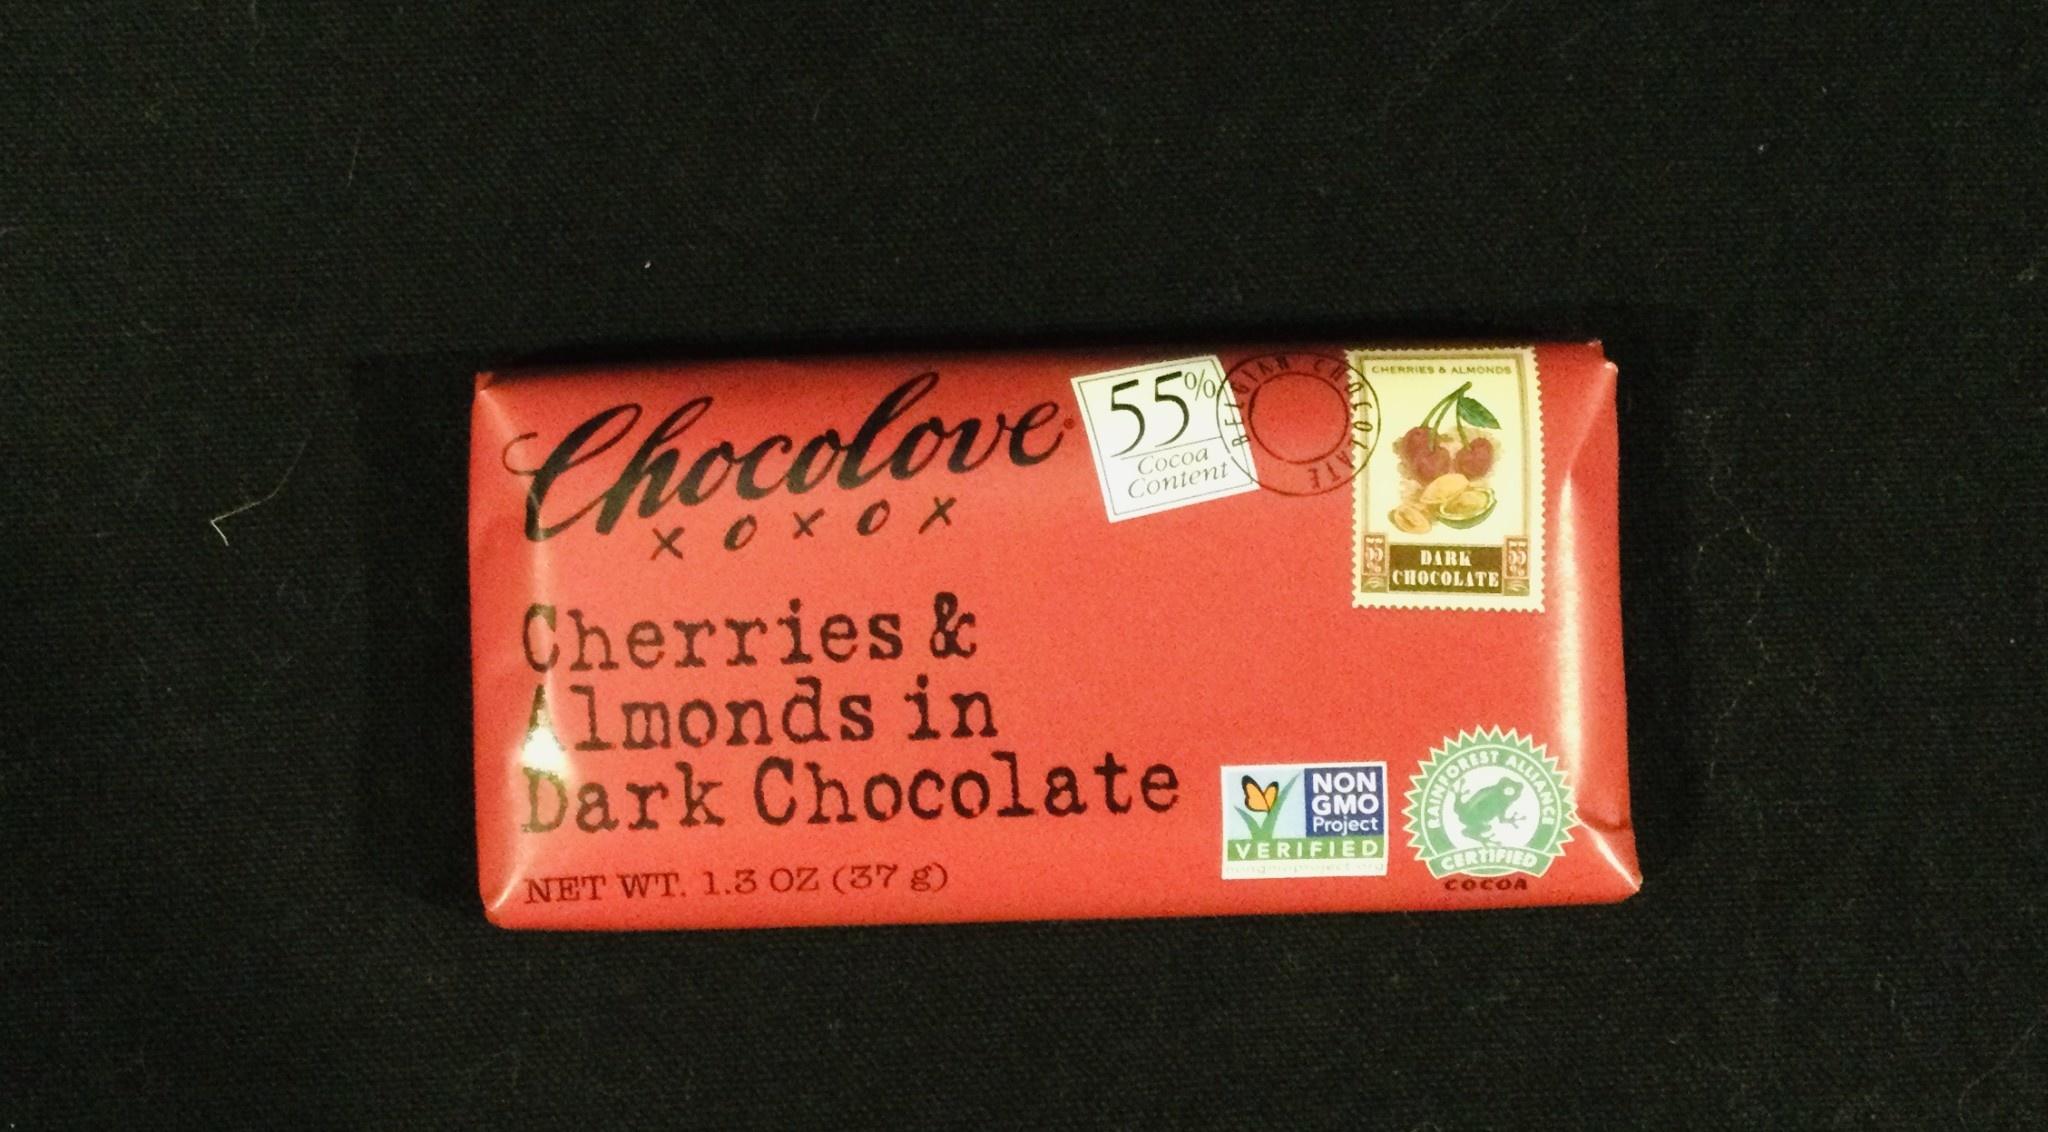 Chocolove Dark Chocolate Cherry & Almond